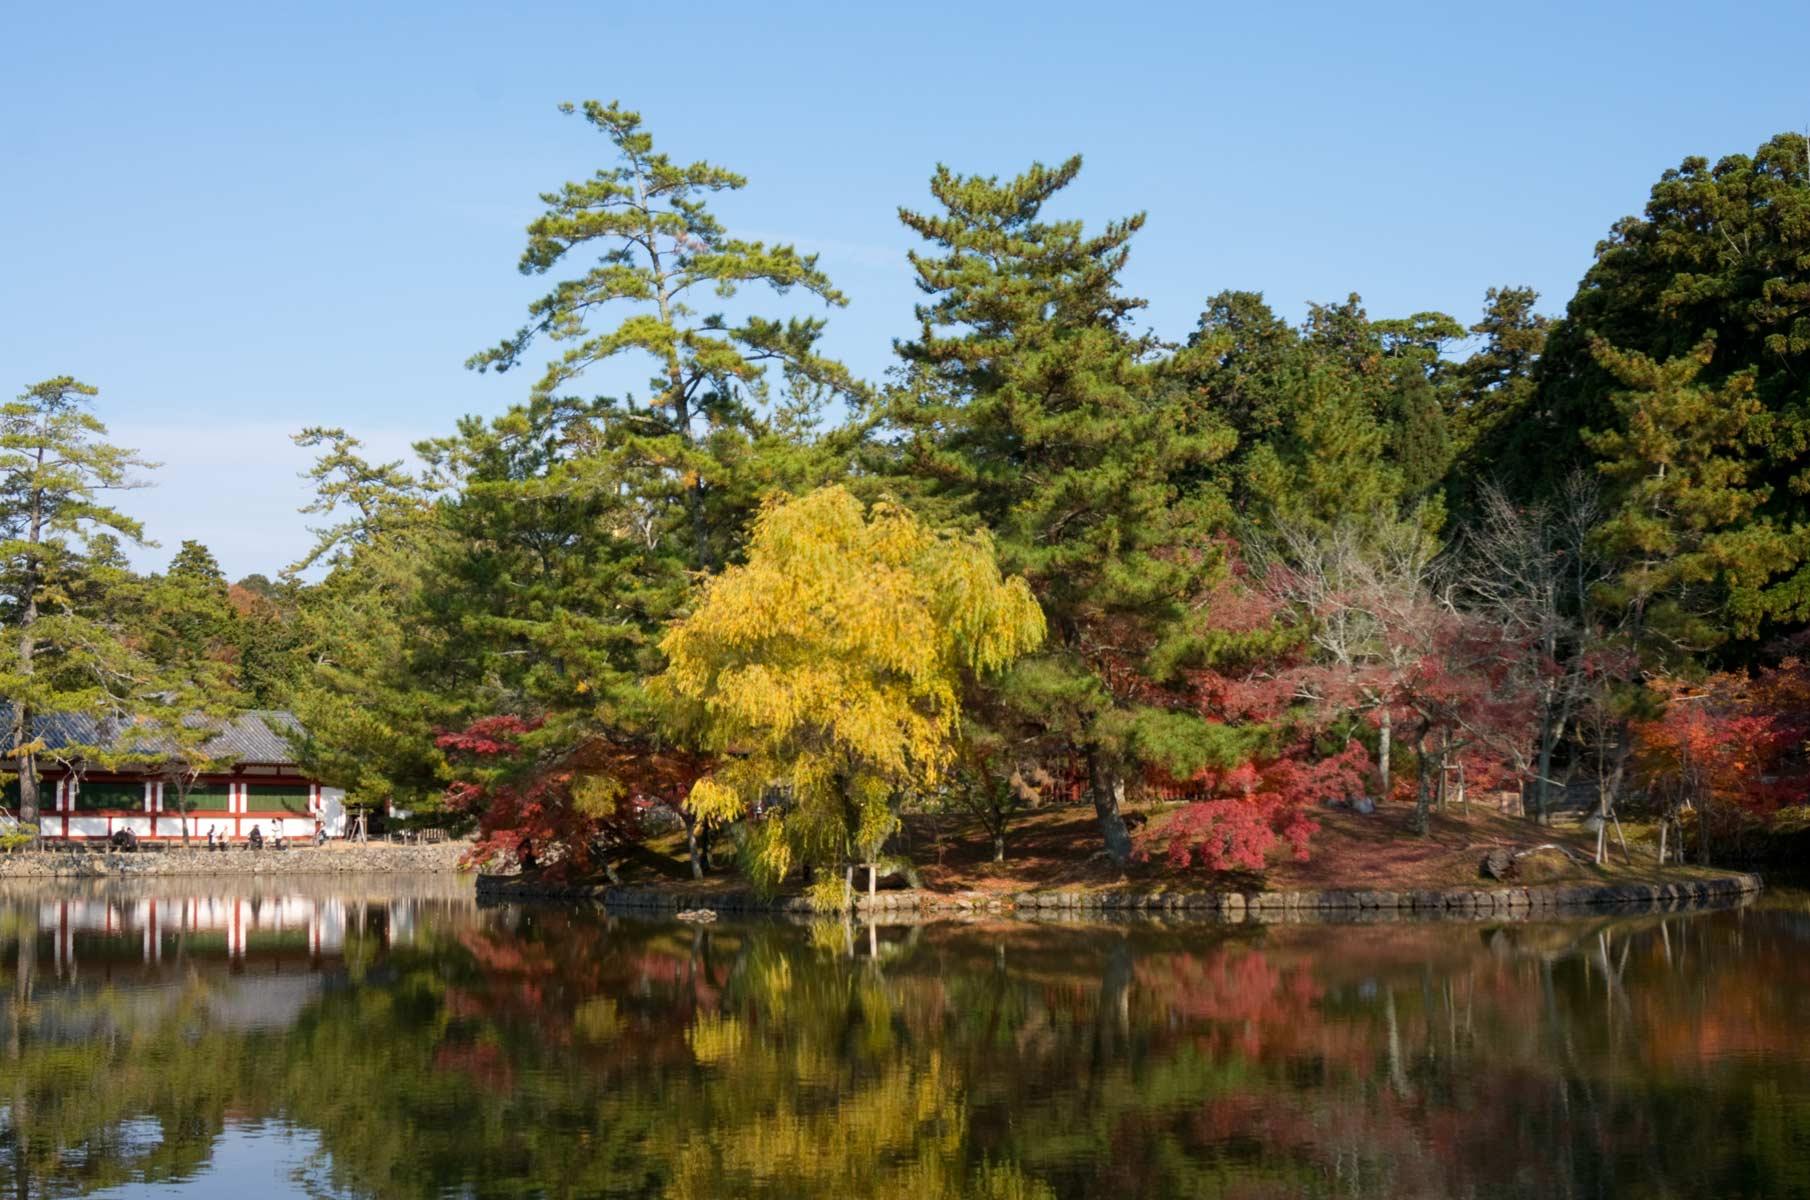 Herbstlaub am See im Nara Park in Nara, Japan